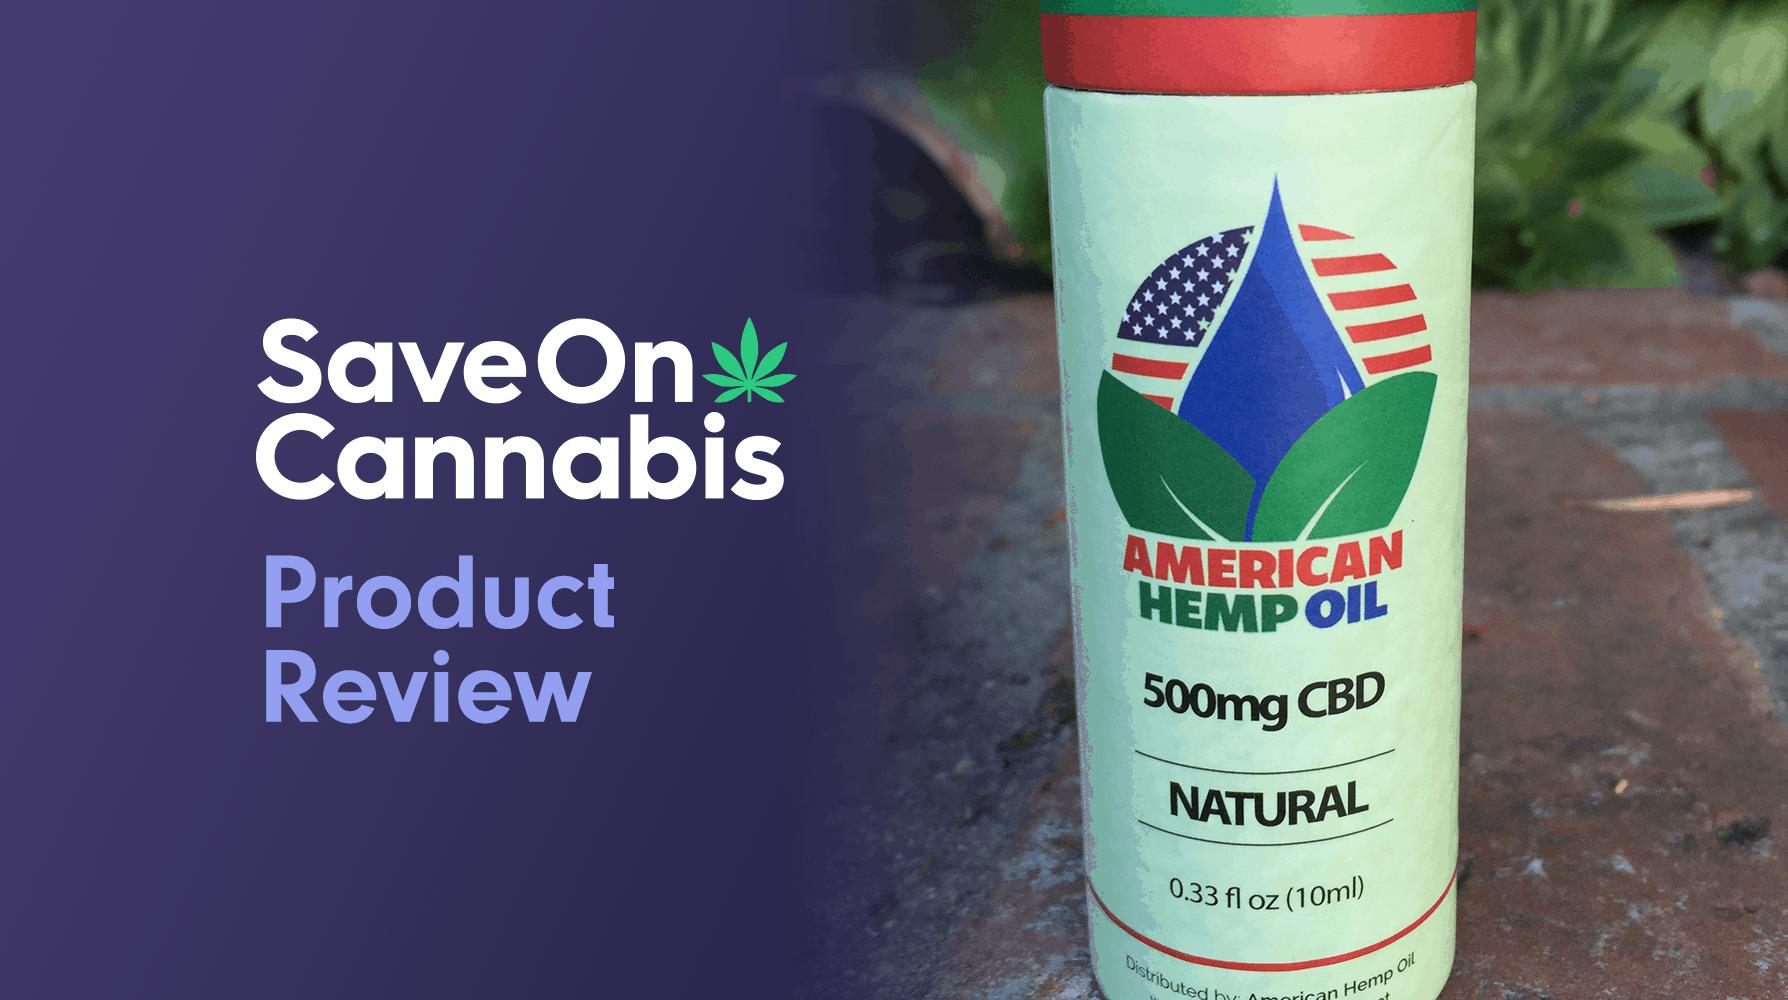 american hemp oil pure cbd hemp oil 500 mg review save on cannabis Website